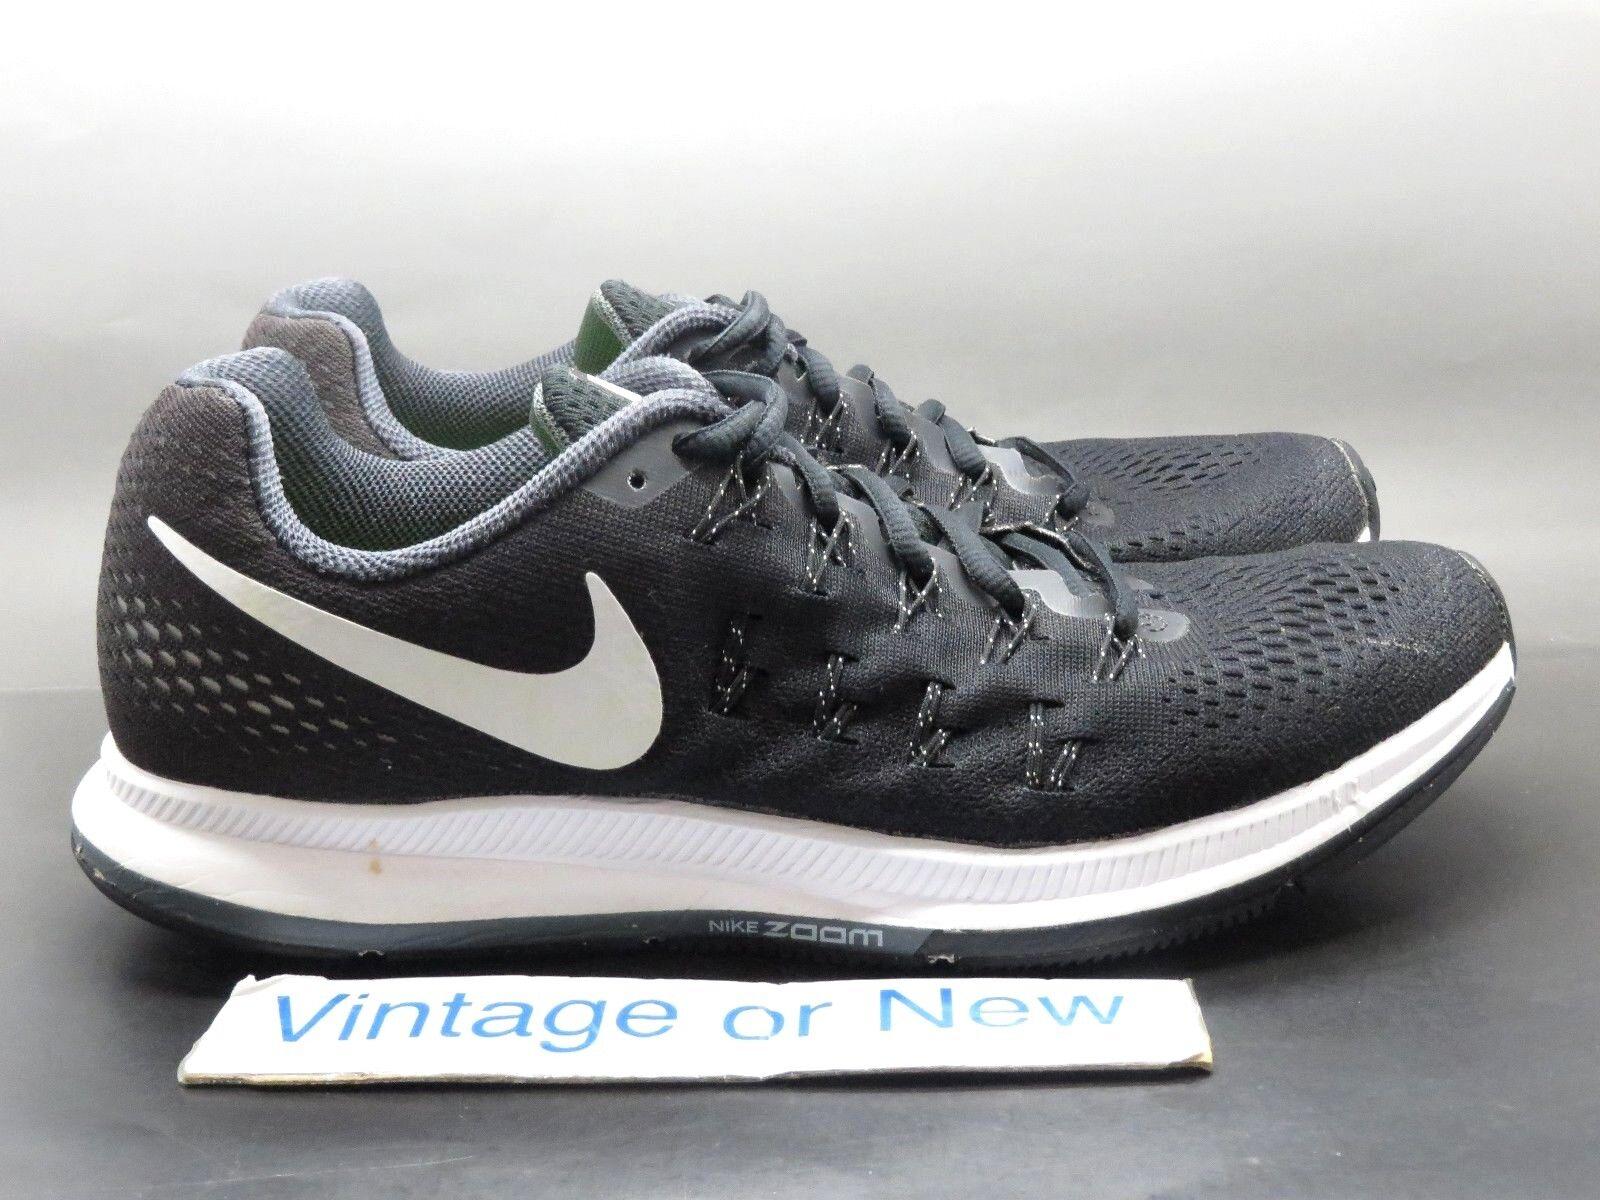 Nike Air Zoom Pegasus 33 Black White Anthracite Running Shoes 831352-001 sz 9